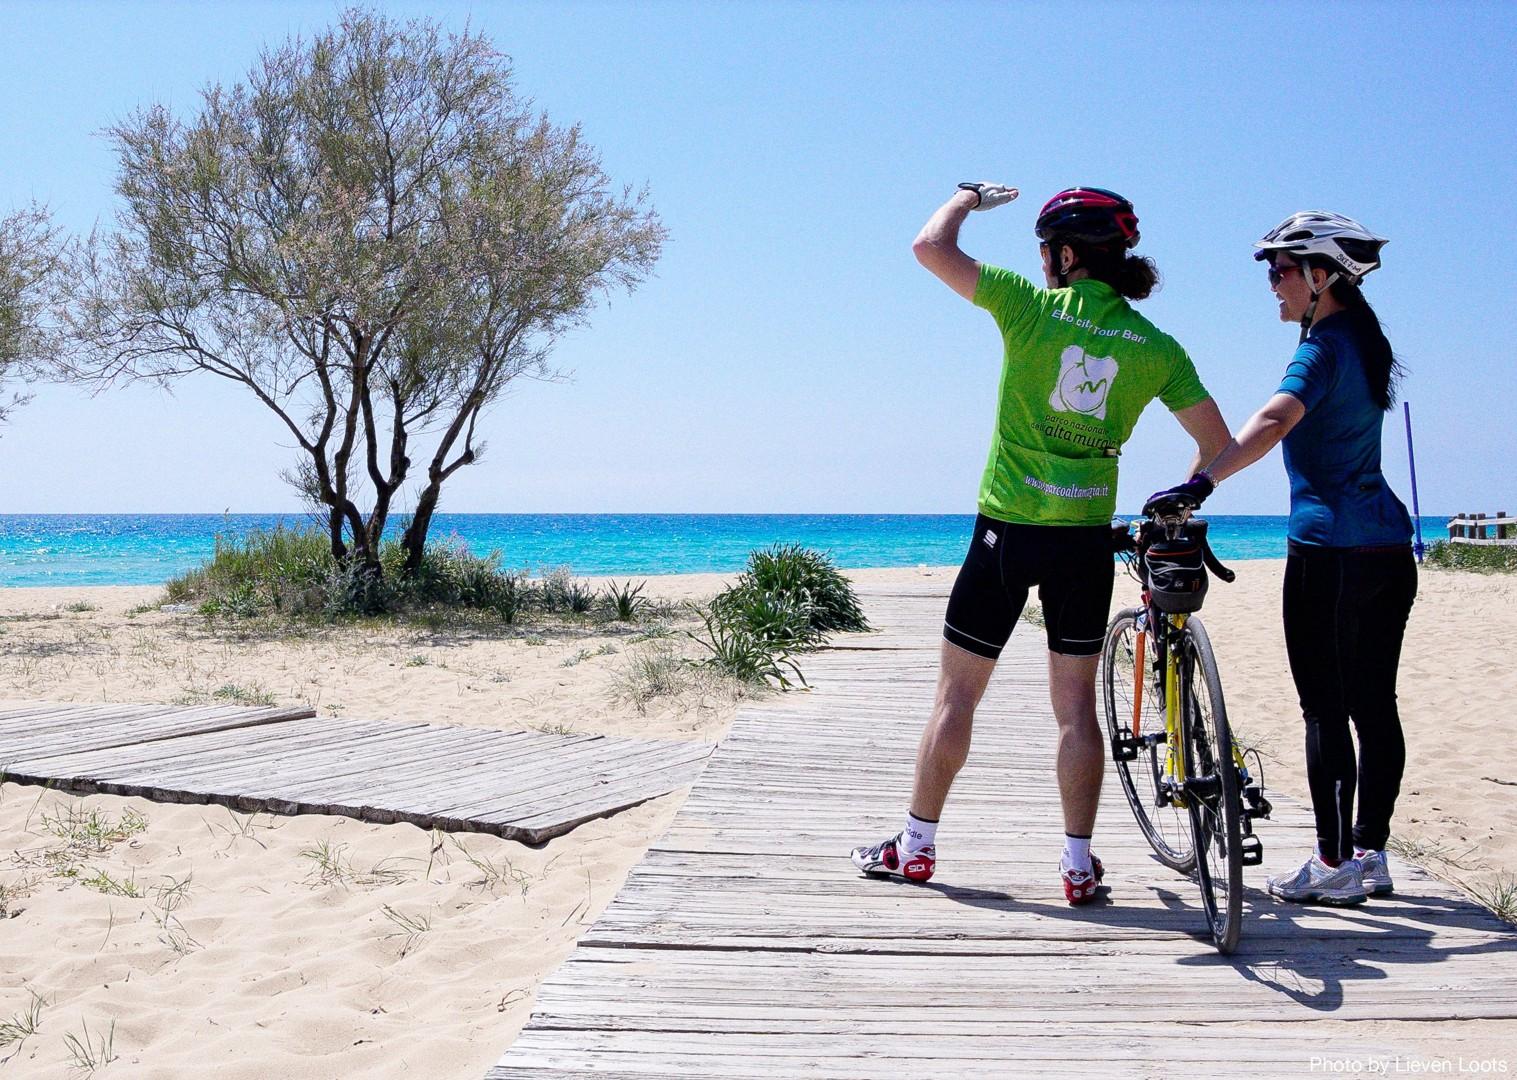 coastal-views-puglia-group-guided-cycling-holiday.jpg - Italy - Puglia - The Beautiful South - Road Cycling